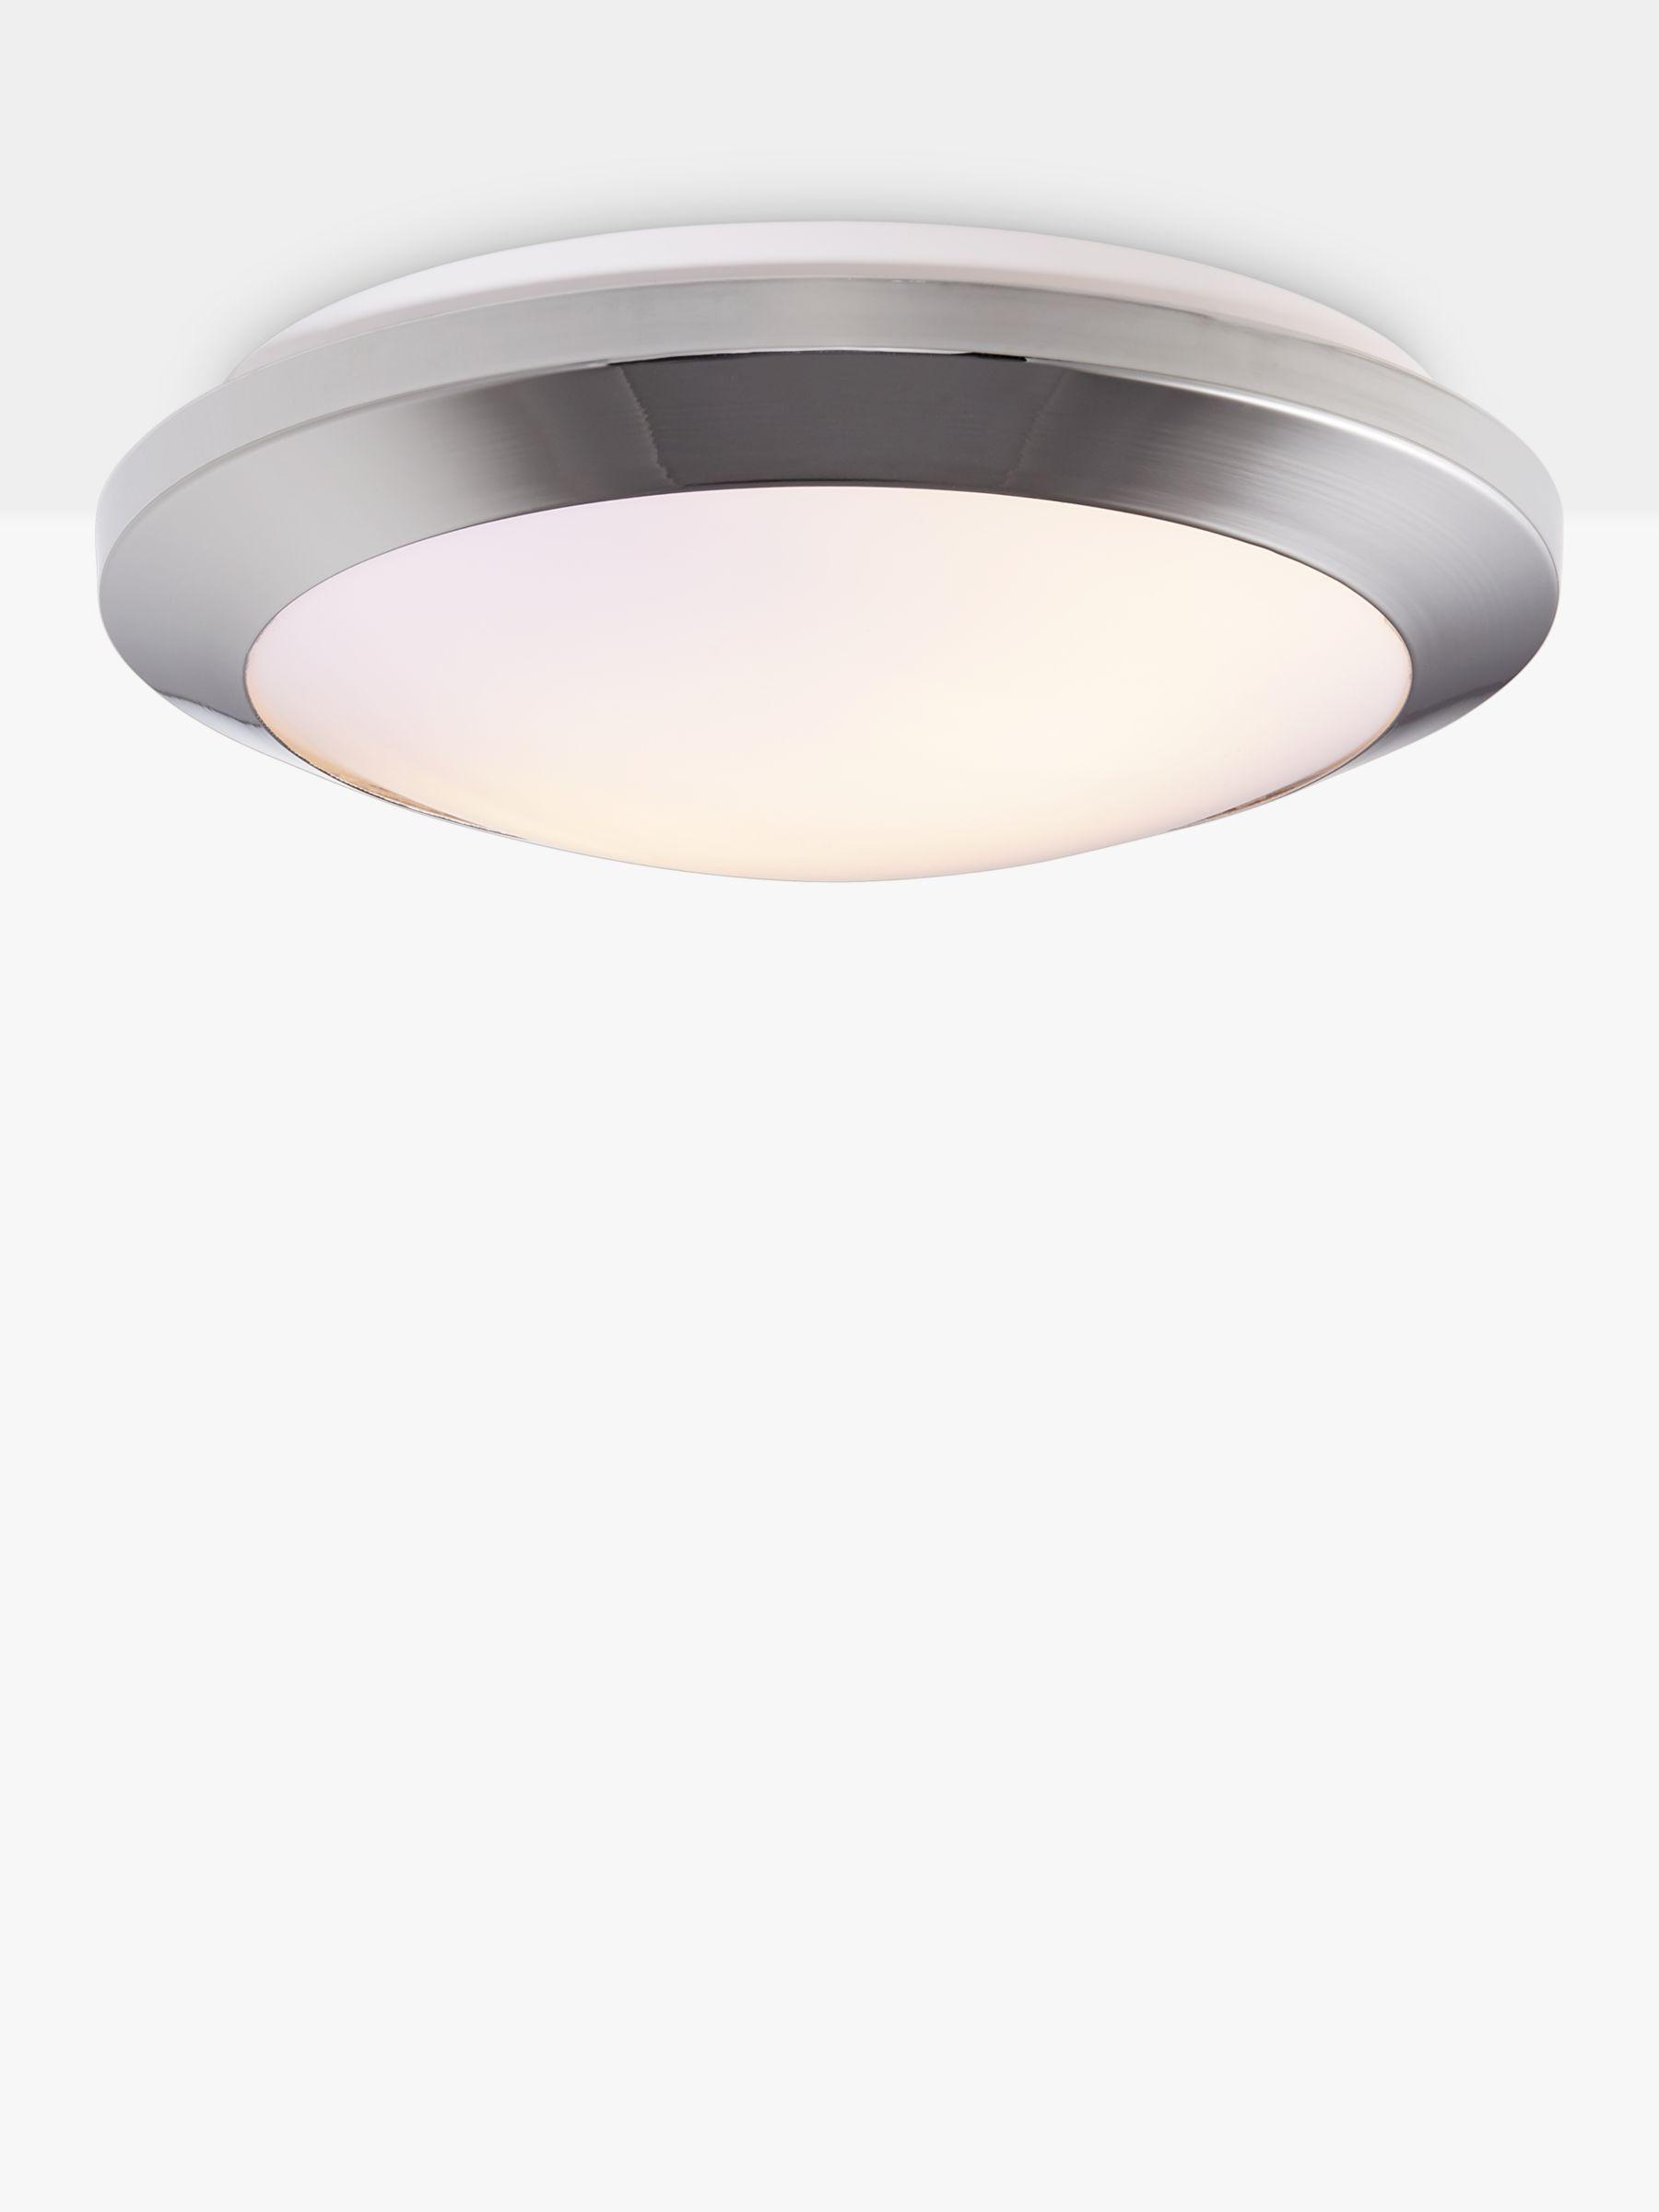 Light Fixtures For Bathroom Ceiling Small Bathroom Ceiling Light